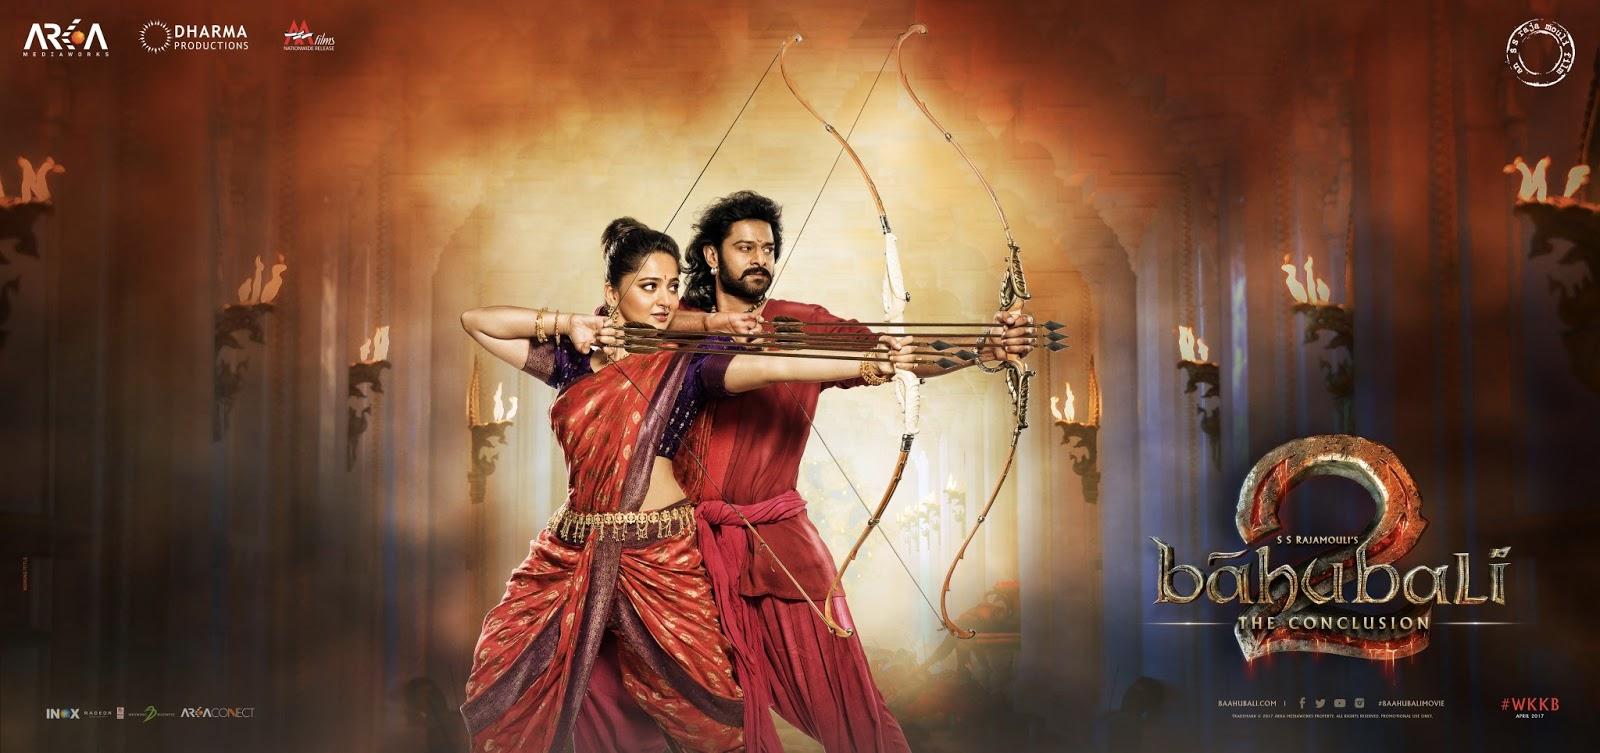 Will Prabhas' Baahubali 2 BEAT Aamir Khan's Dangal to become